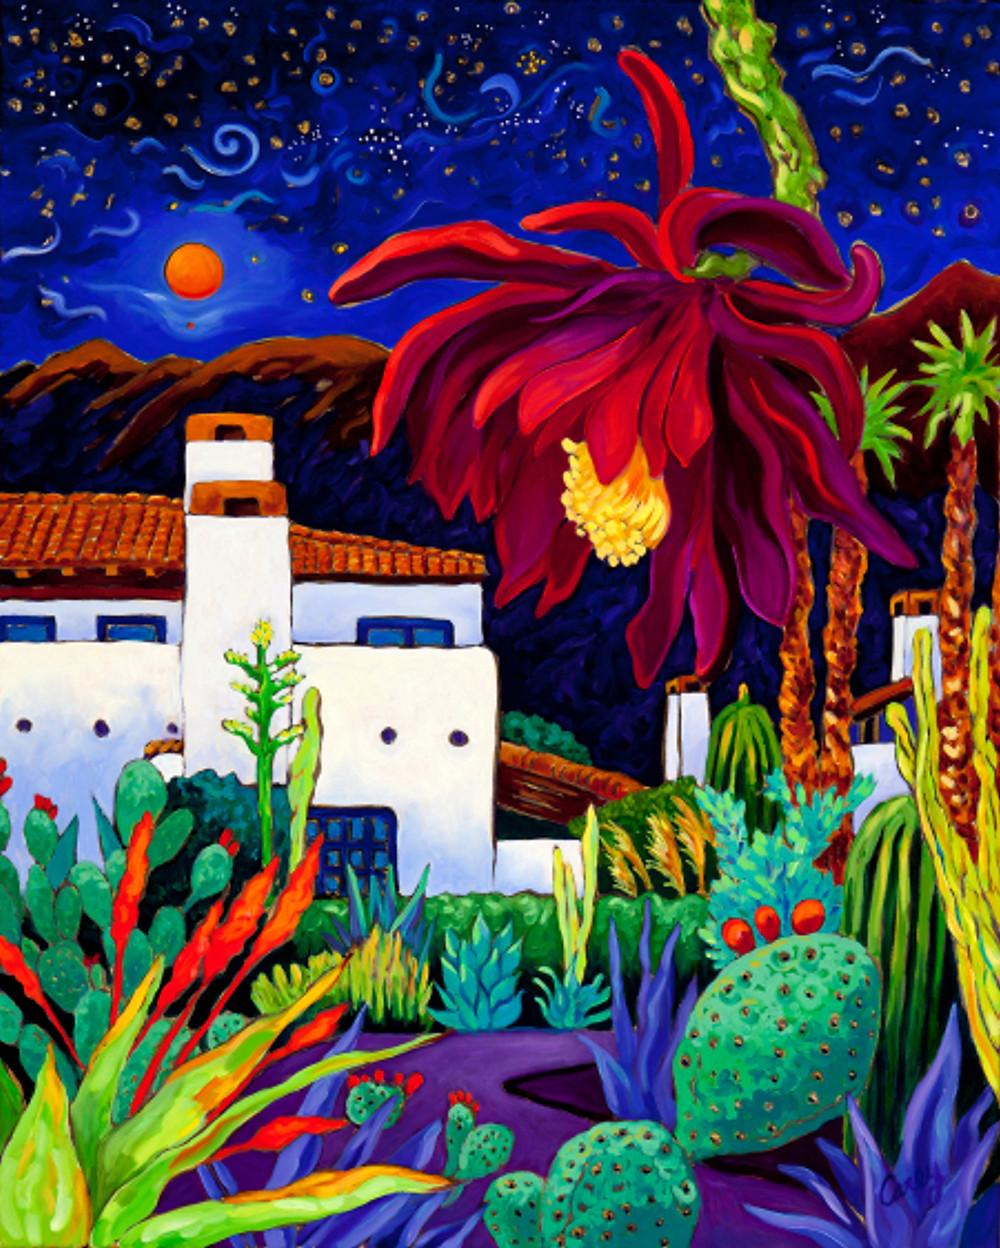 Desert Night Music by Cathy Carey ©2014